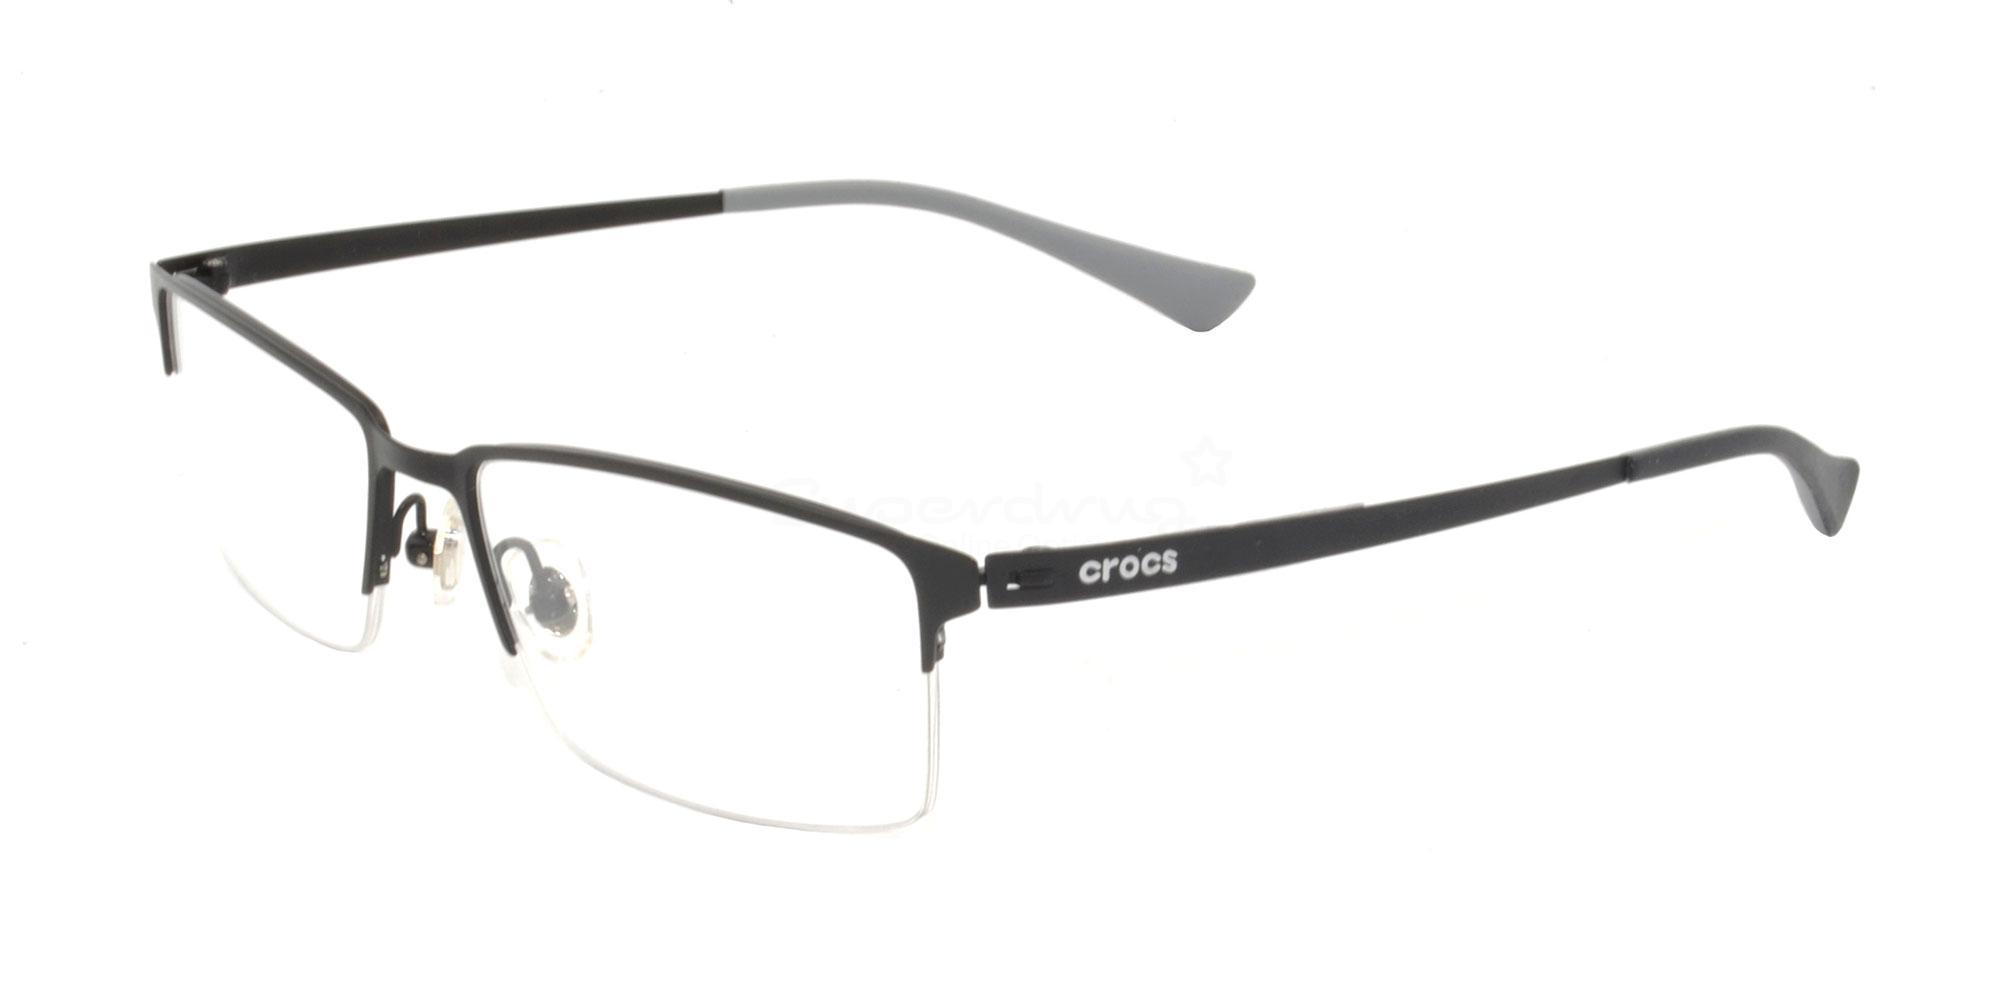 20BK CF4306 Glasses, Crocs Eyewear